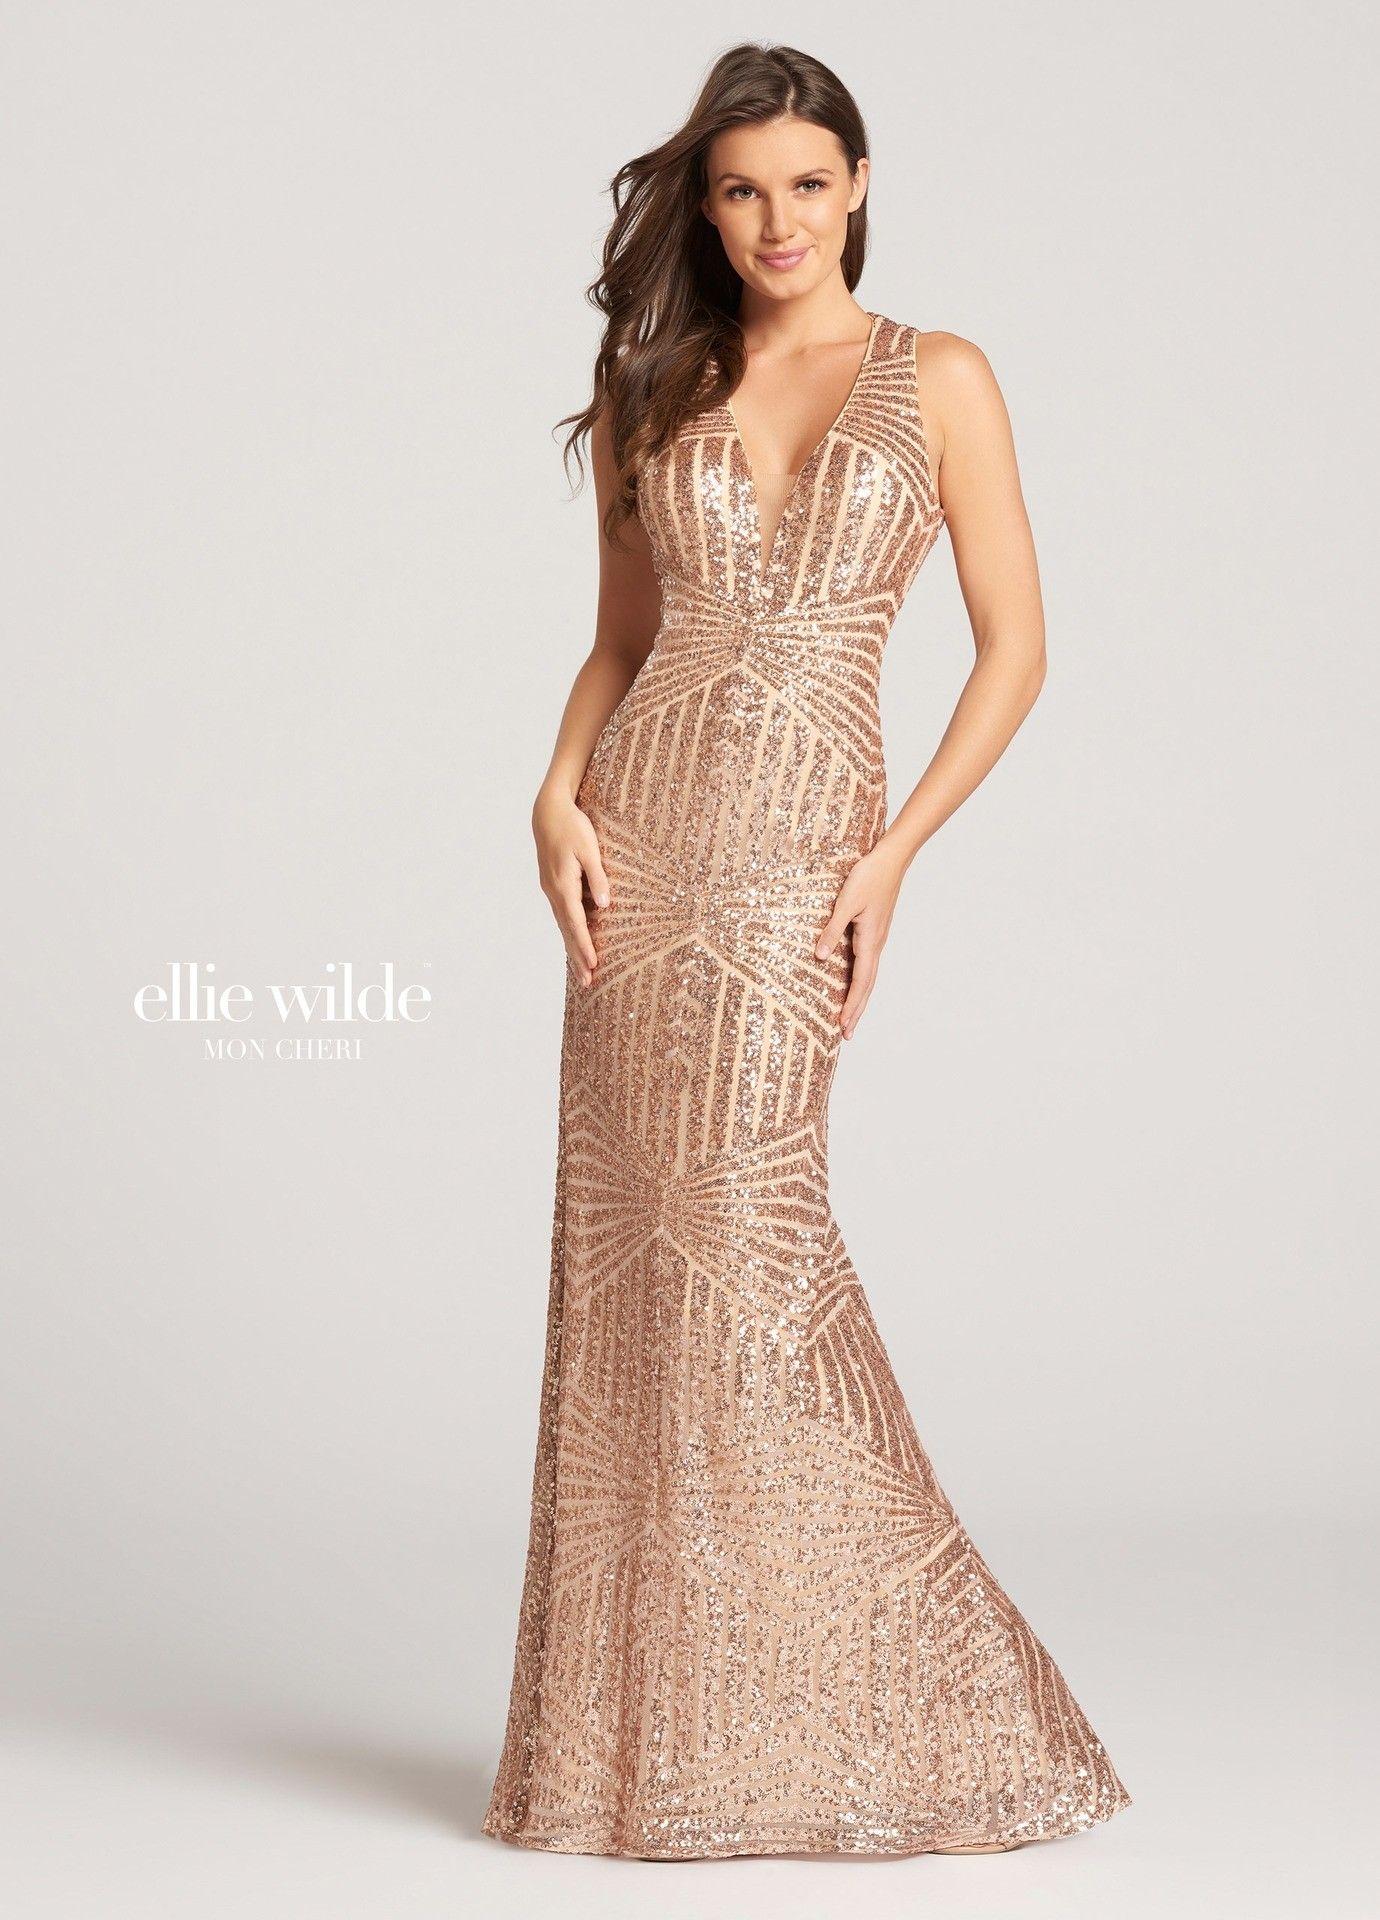 Ellie Wilde Ew118128 Sequin Geometric Print Gown In 2019 Glinda